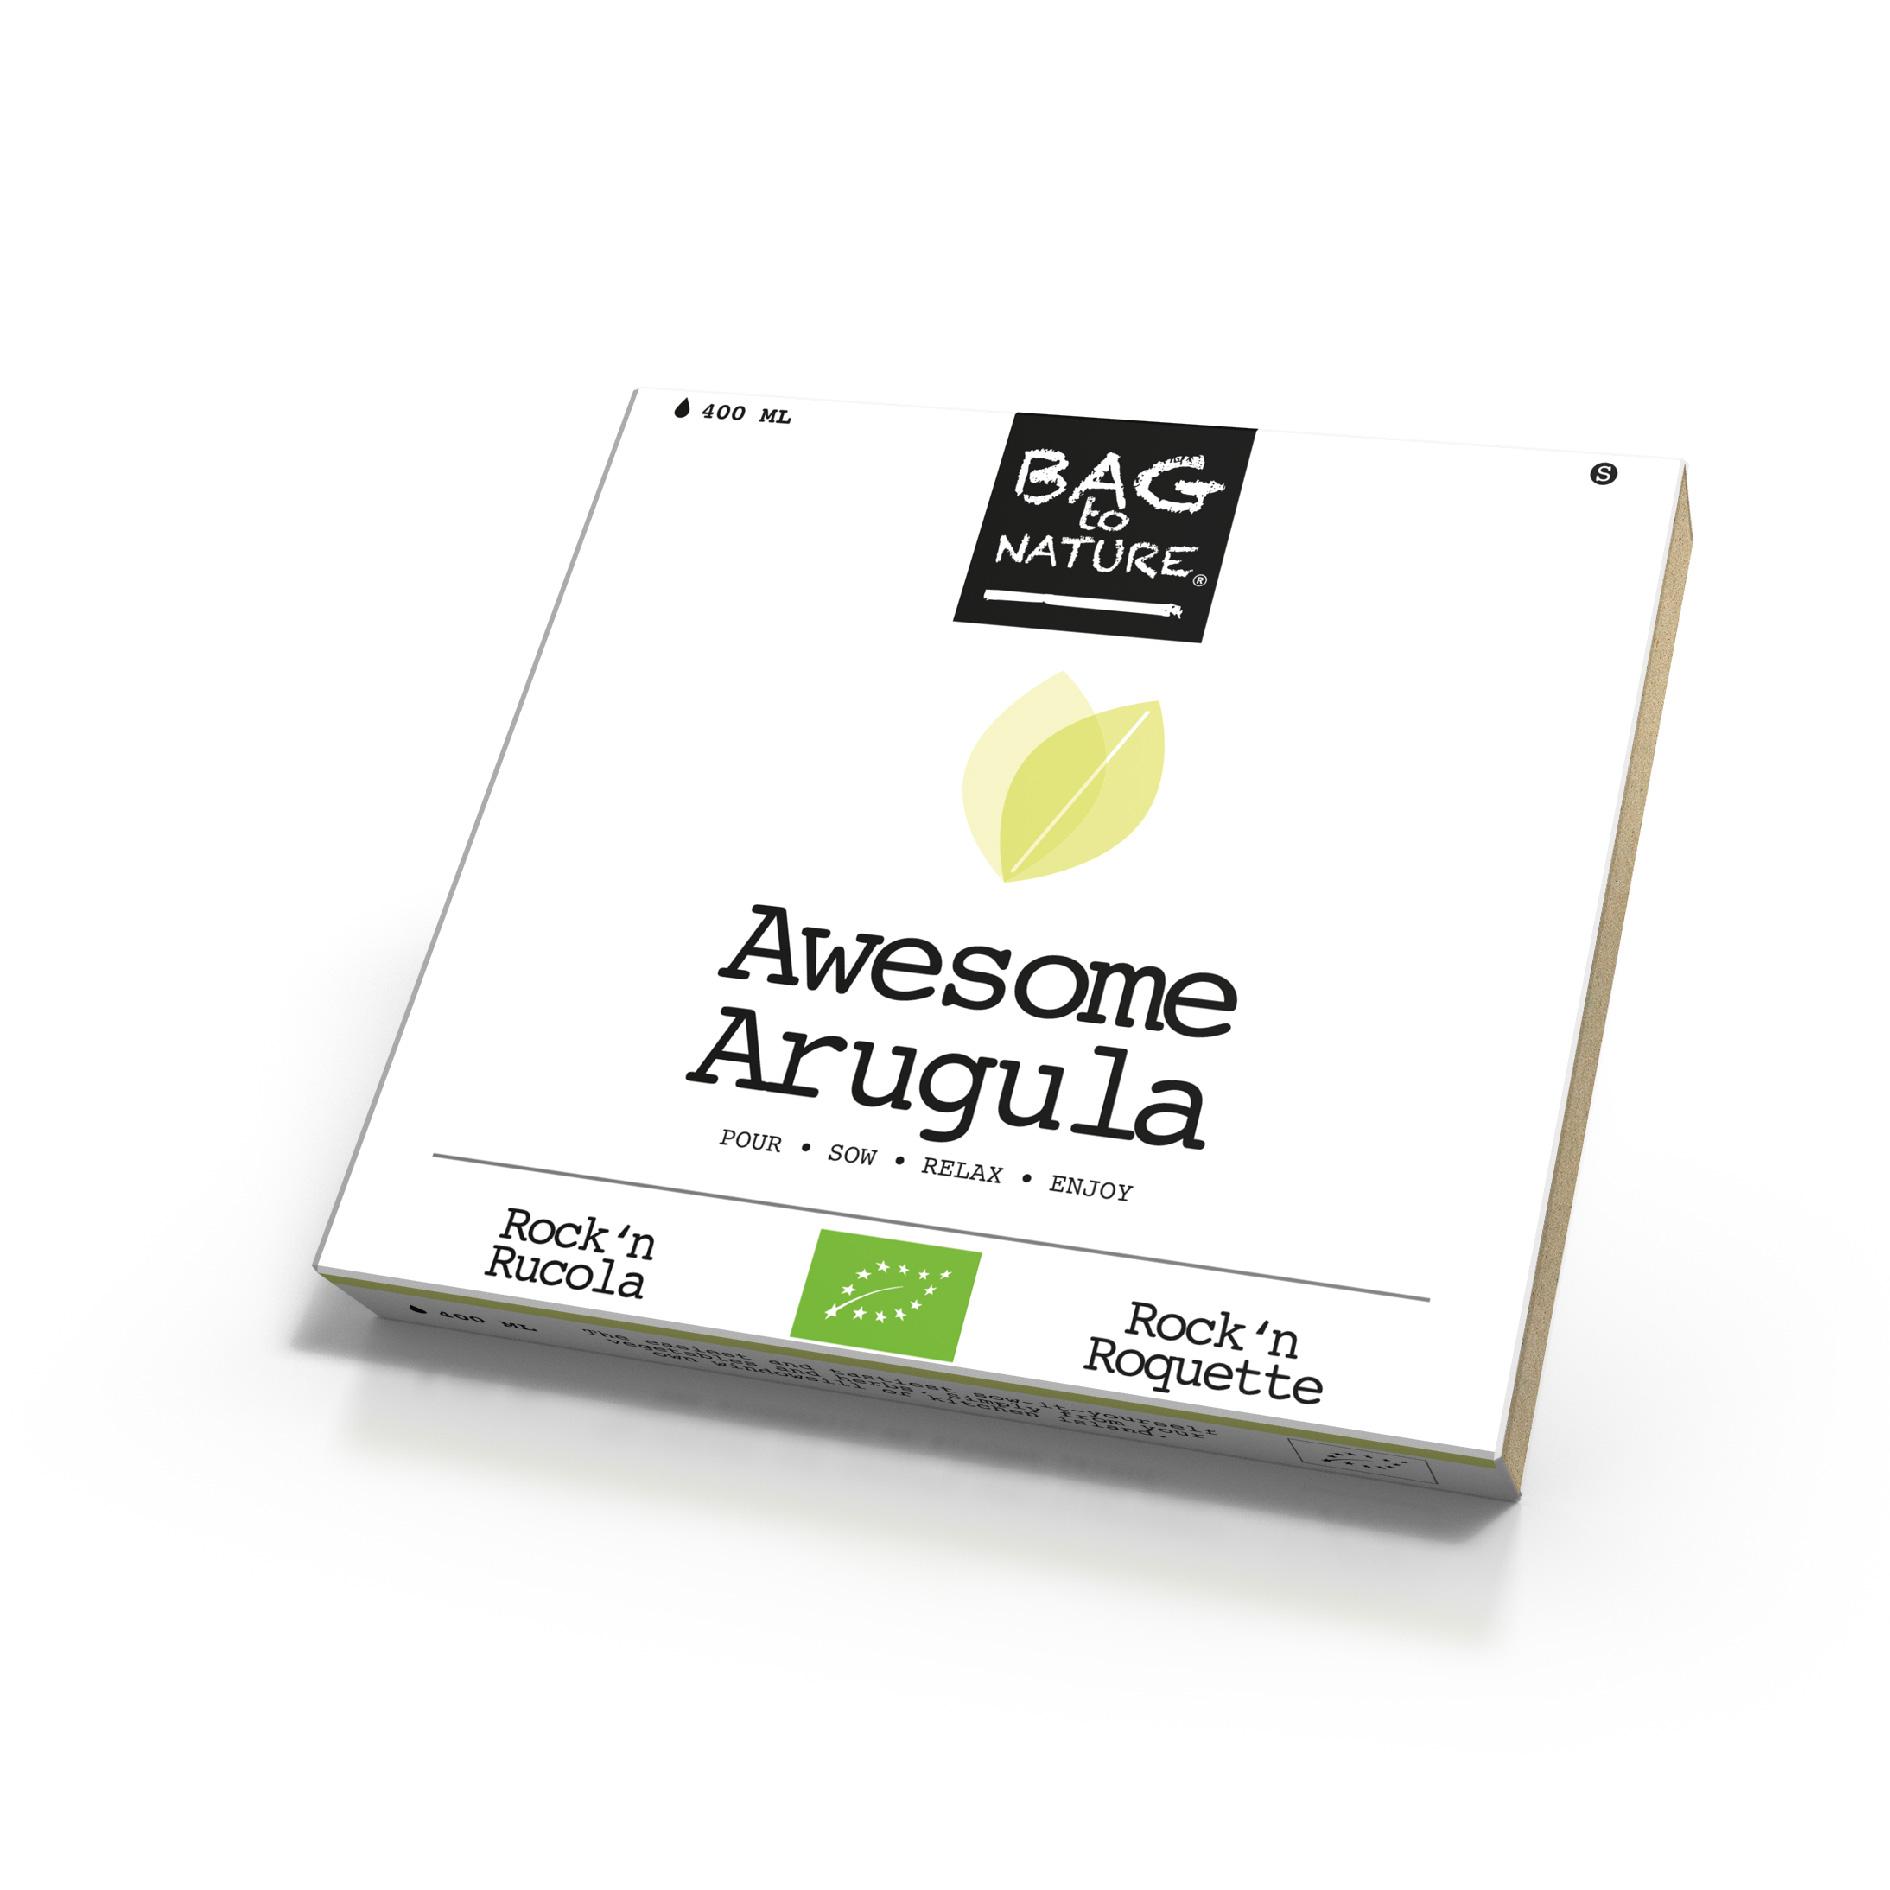 Awesome Arugola